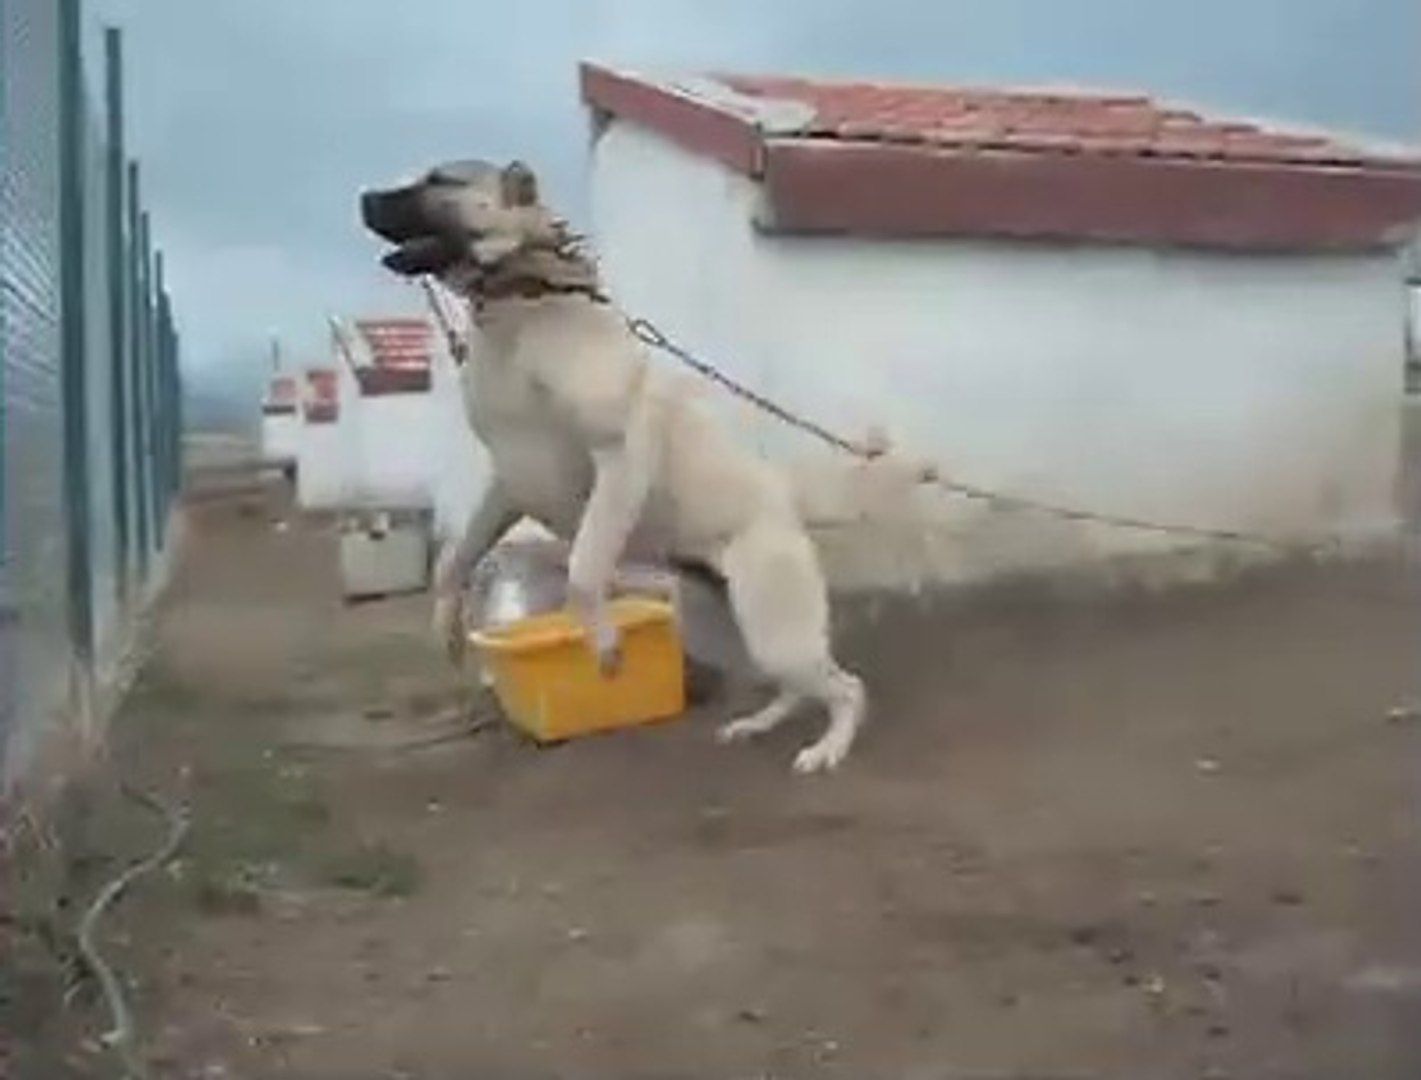 ADAMCI KANGAL KOPEK CiFTLiGiNDE - ANGRY KANGAL on the DOG FARM